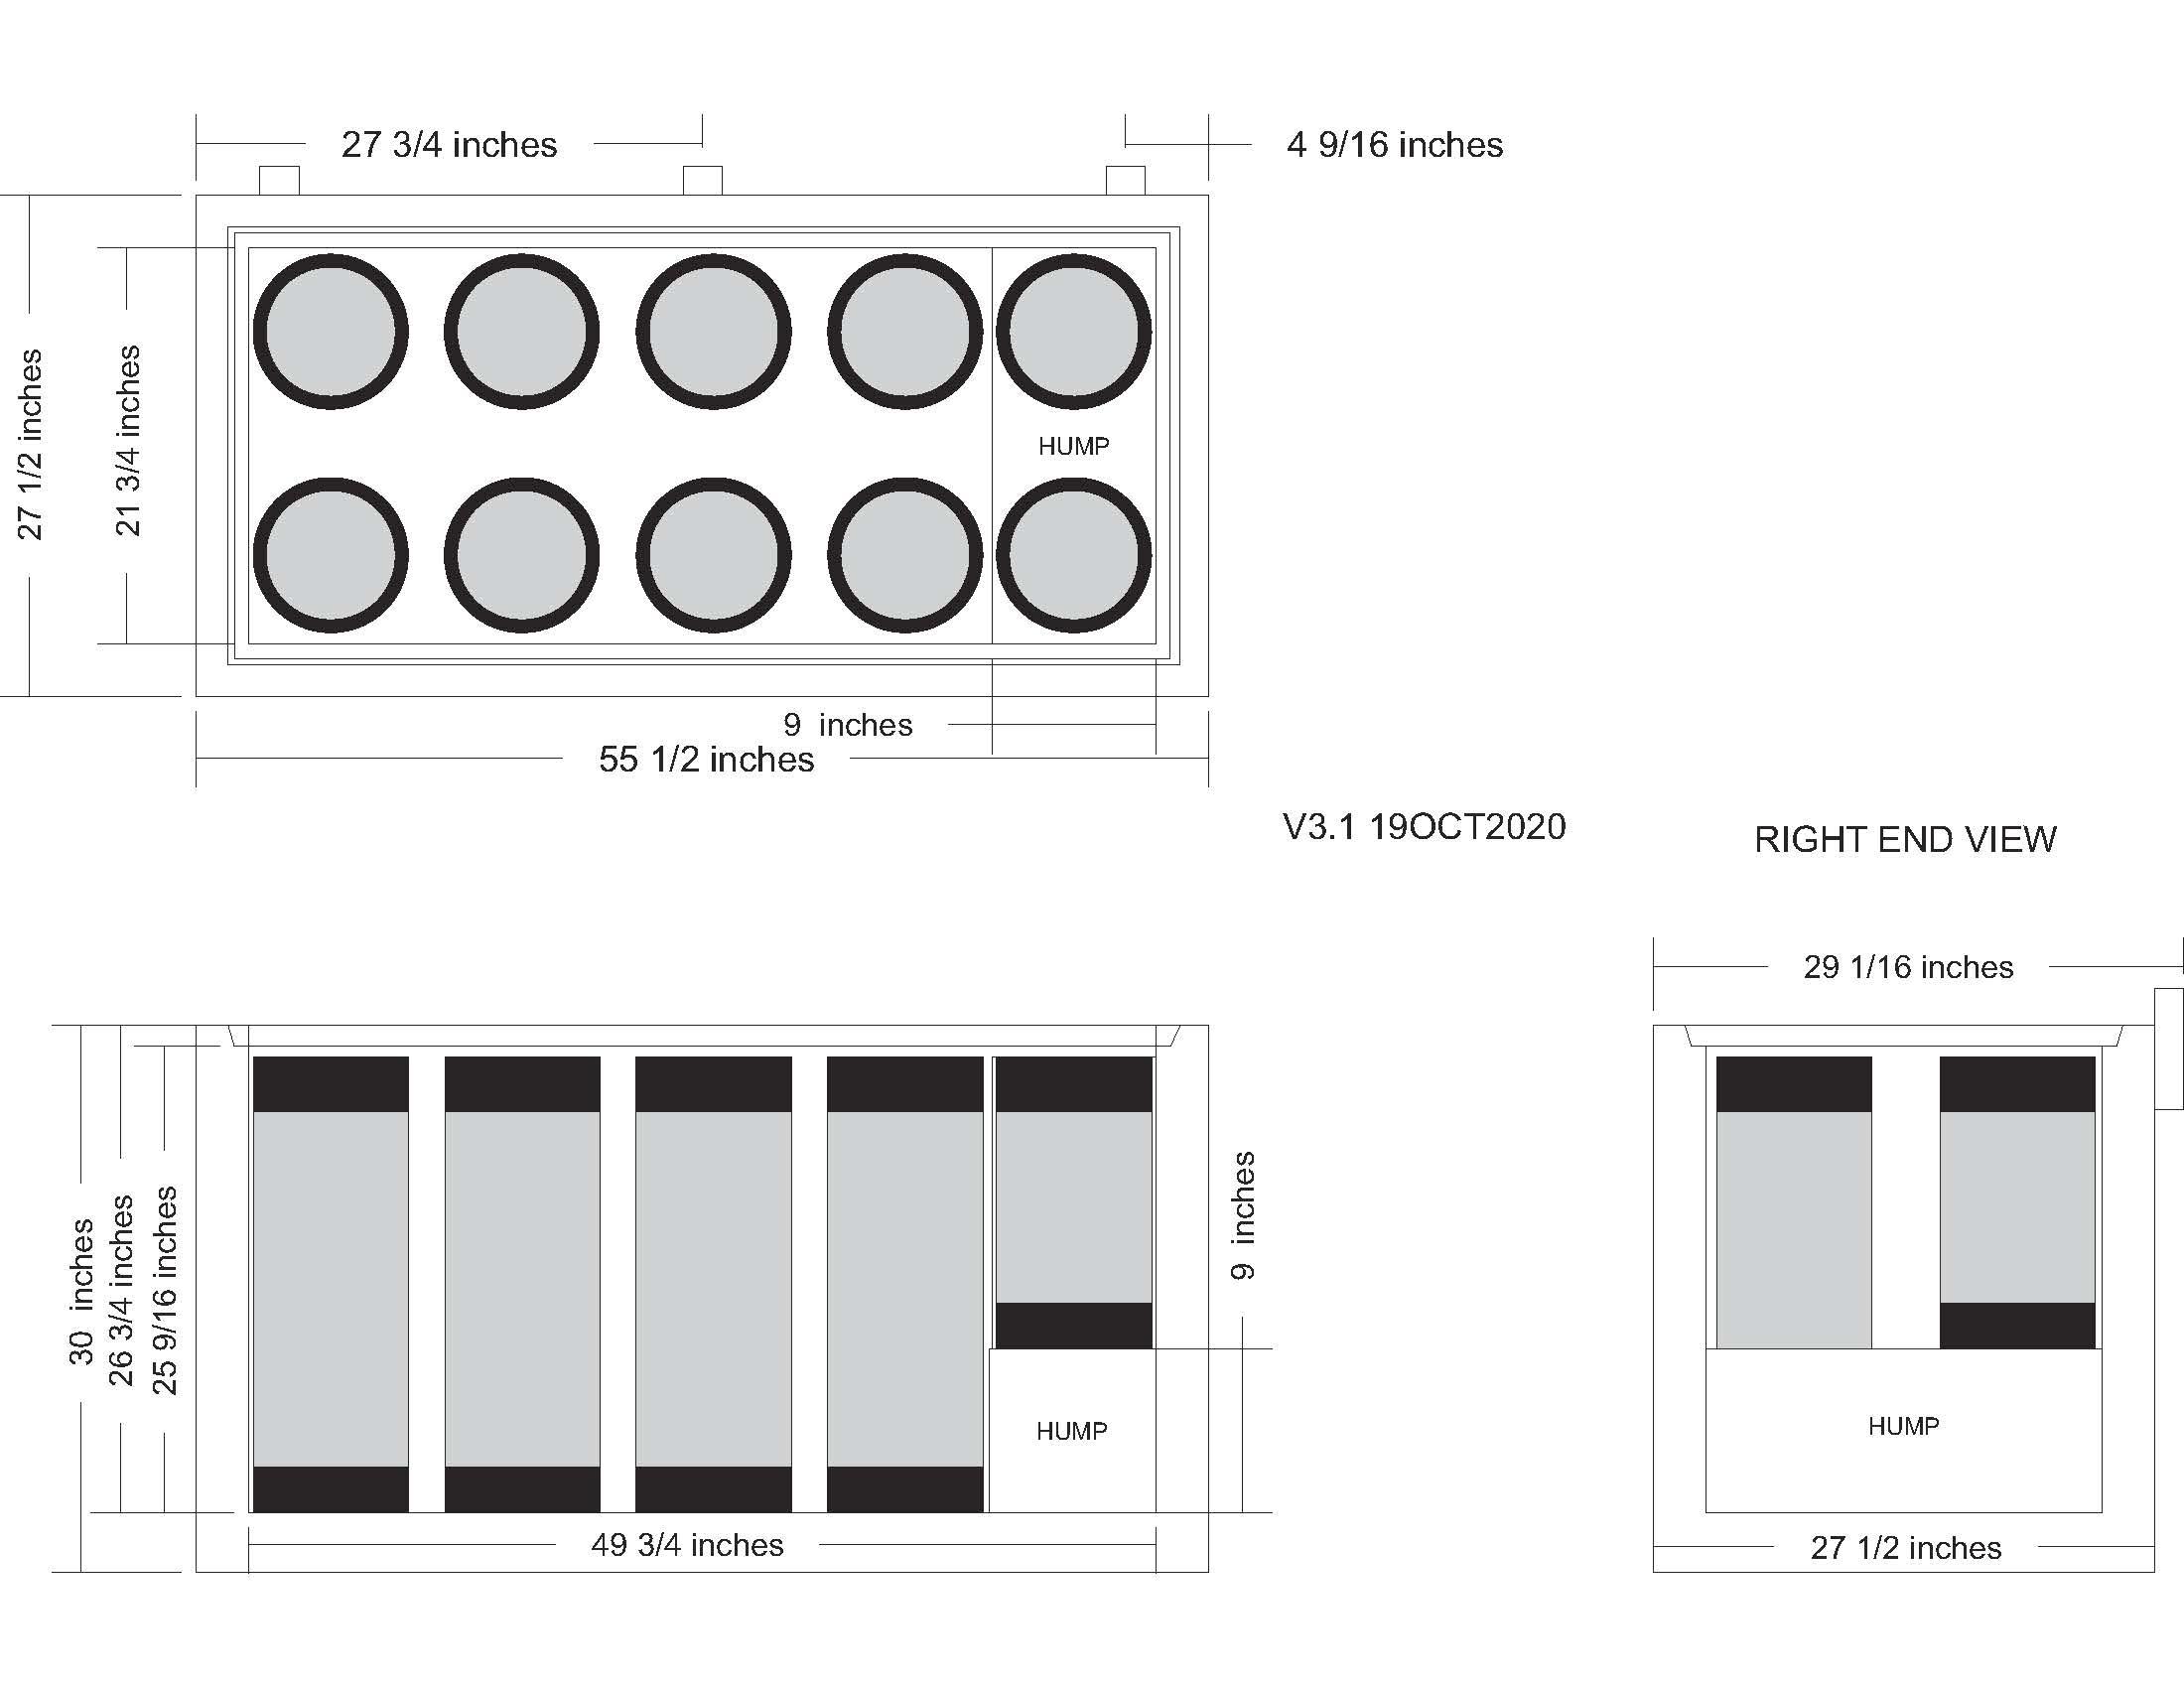 keezer3_cabinet_dimensions.jpg